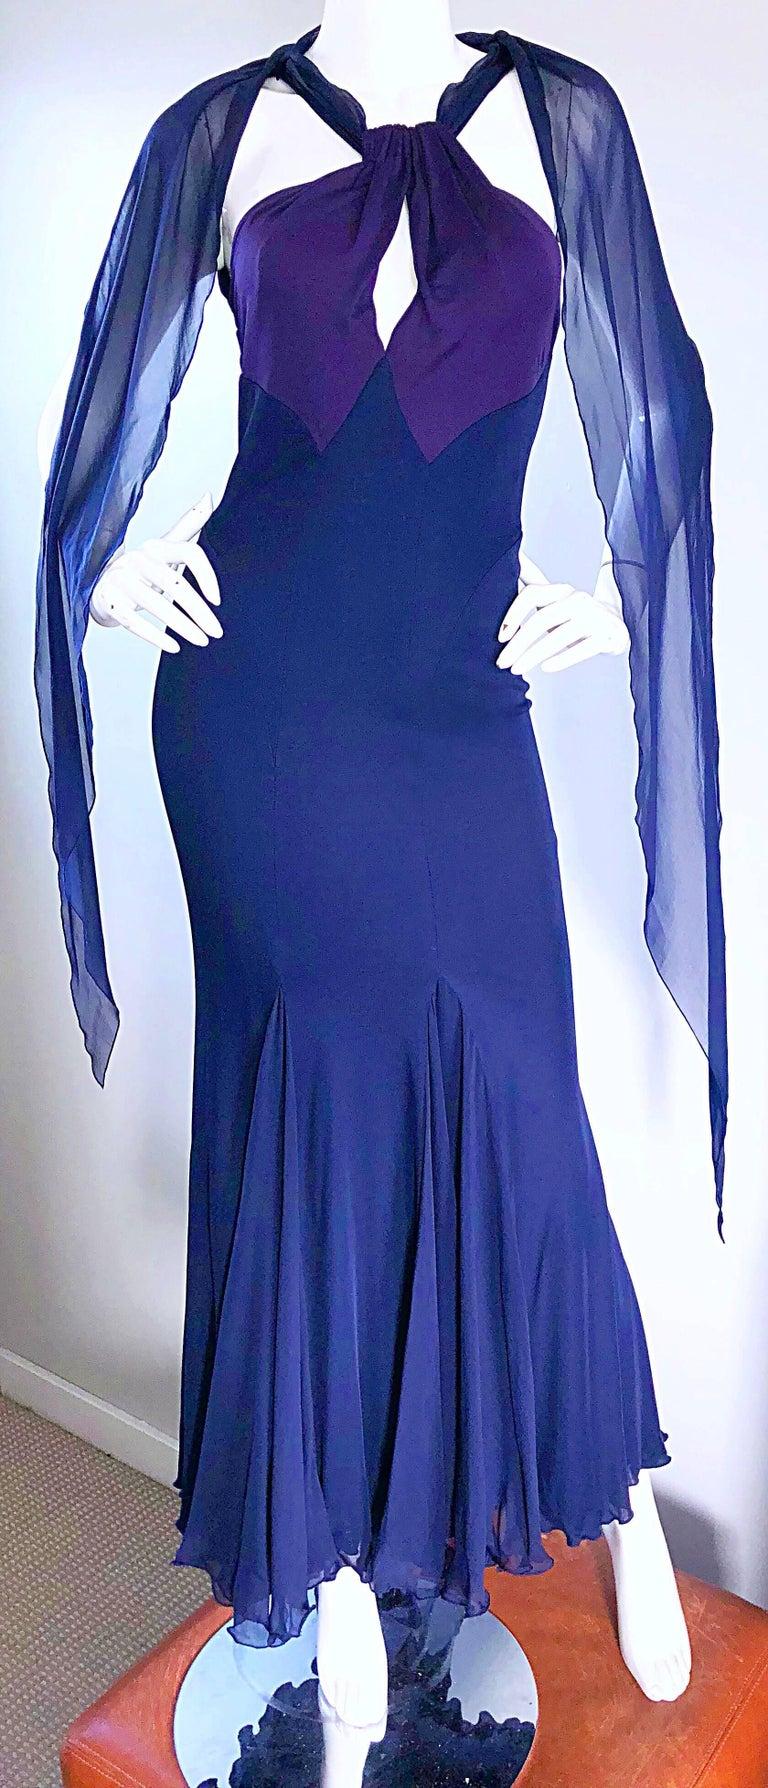 Bill Blass Vintage Silk Jersey and Chiffon Navy Blue Purple Grecian Evening Gown For Sale 4